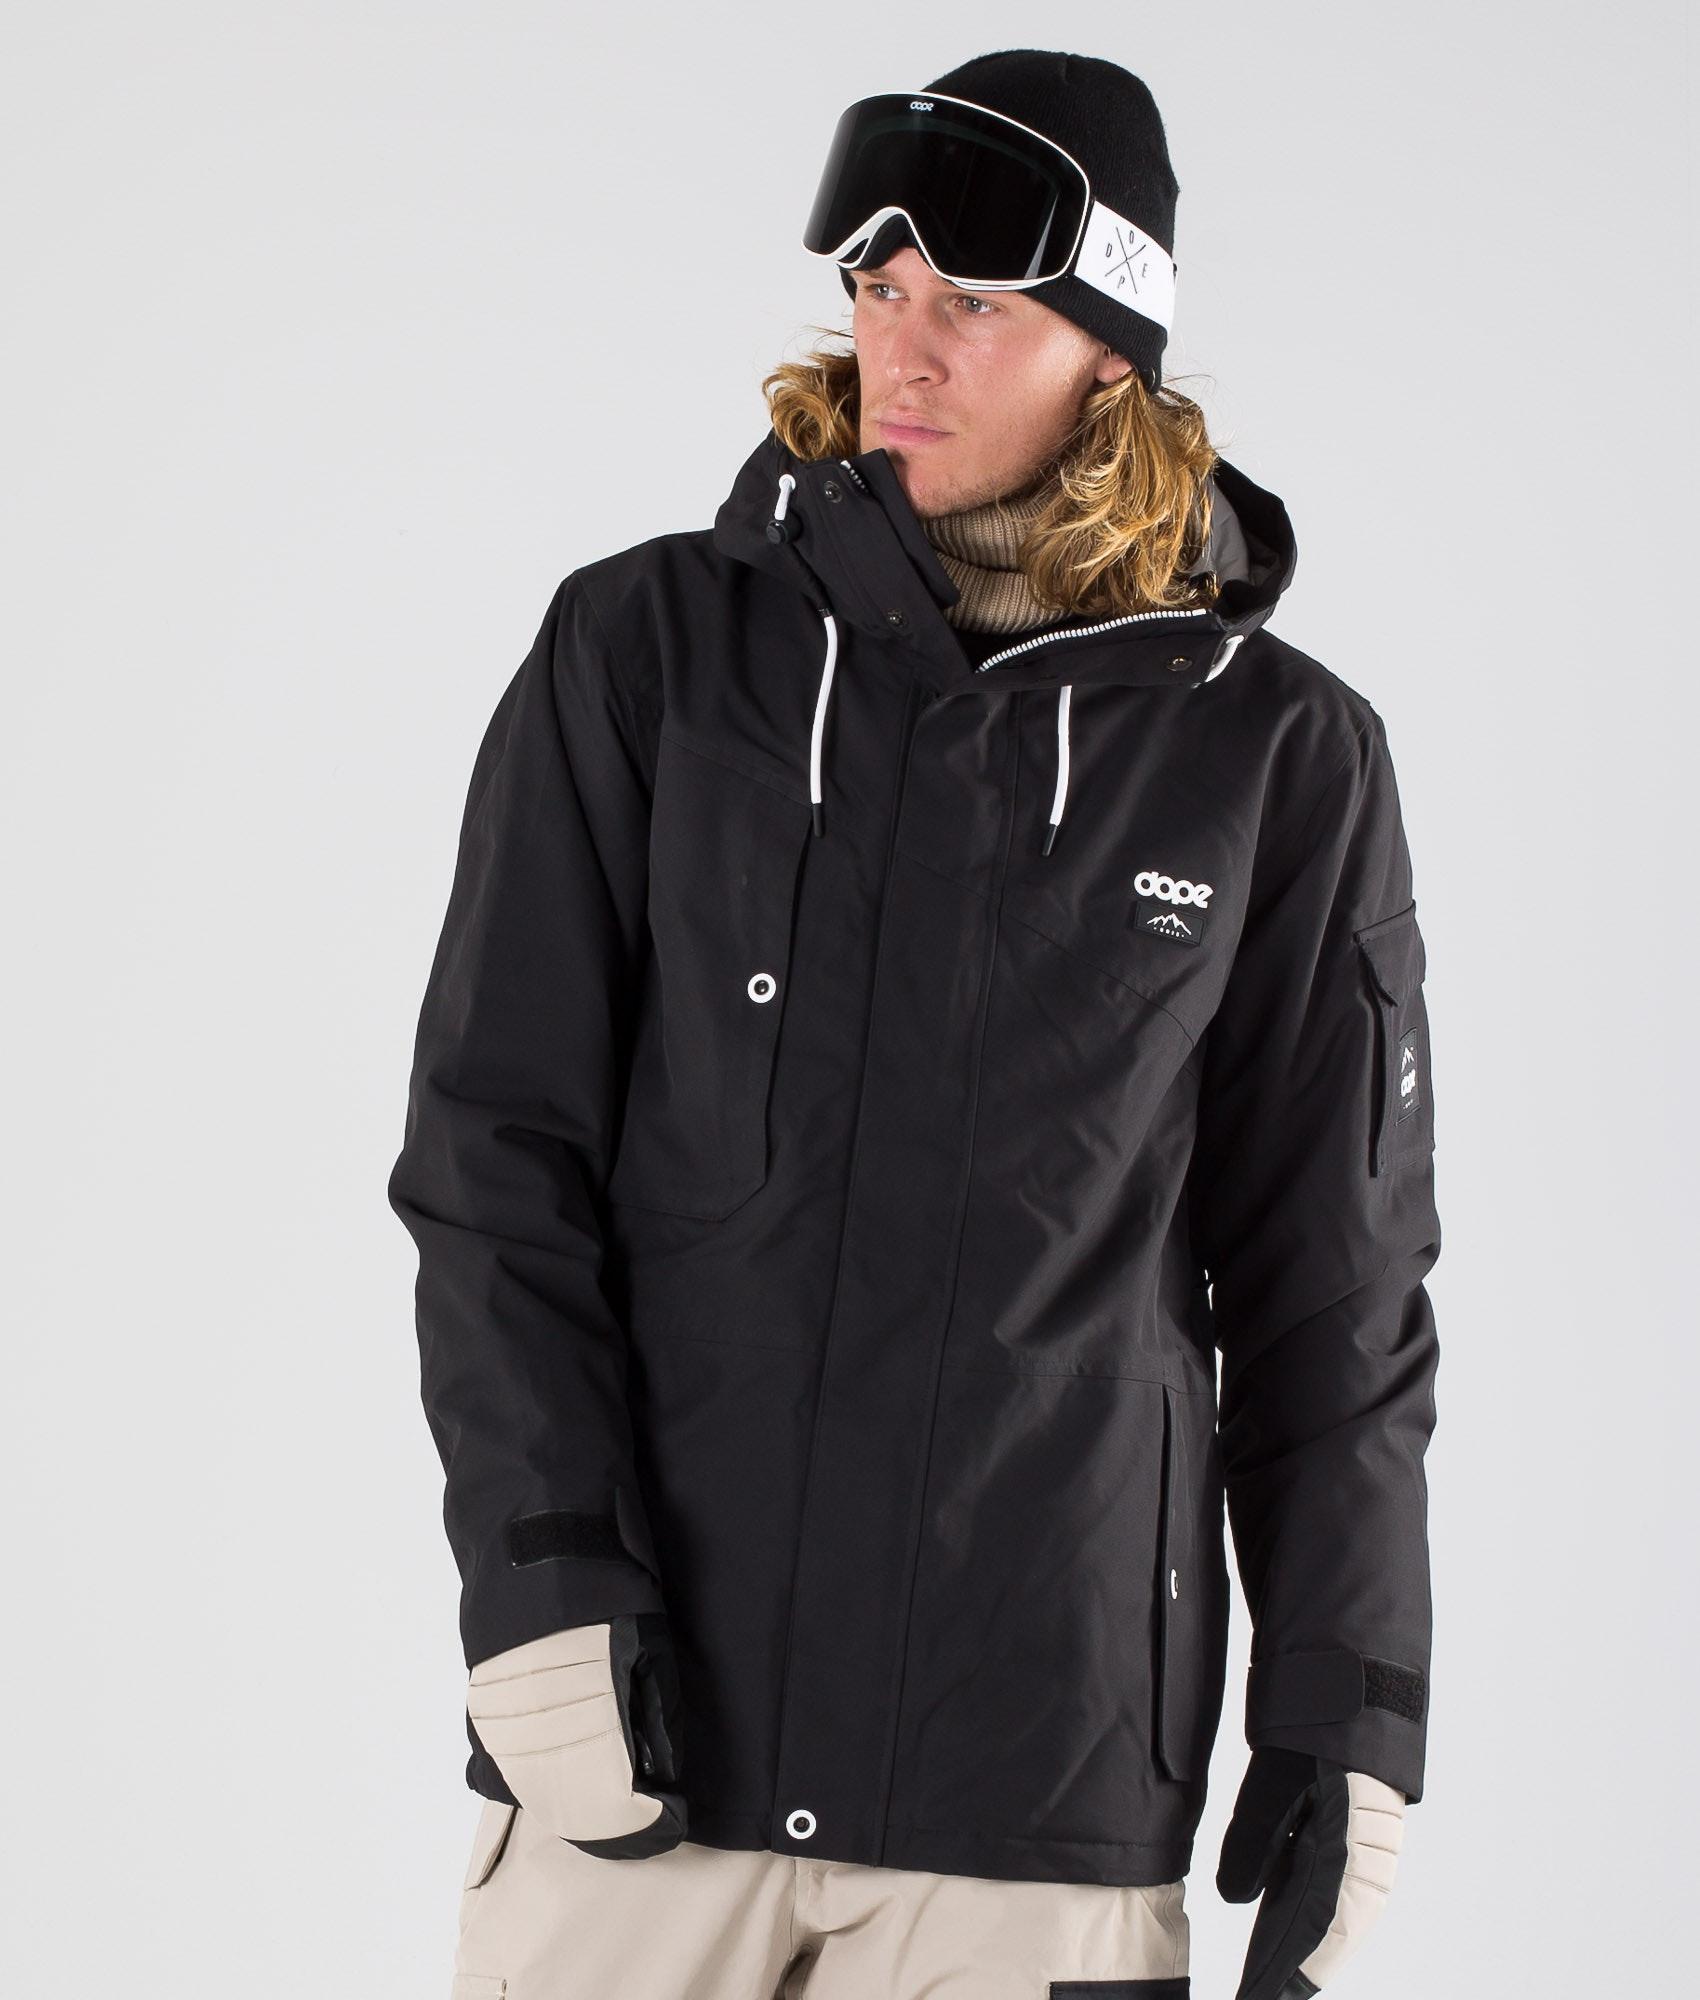 Laver veste de ski blanche